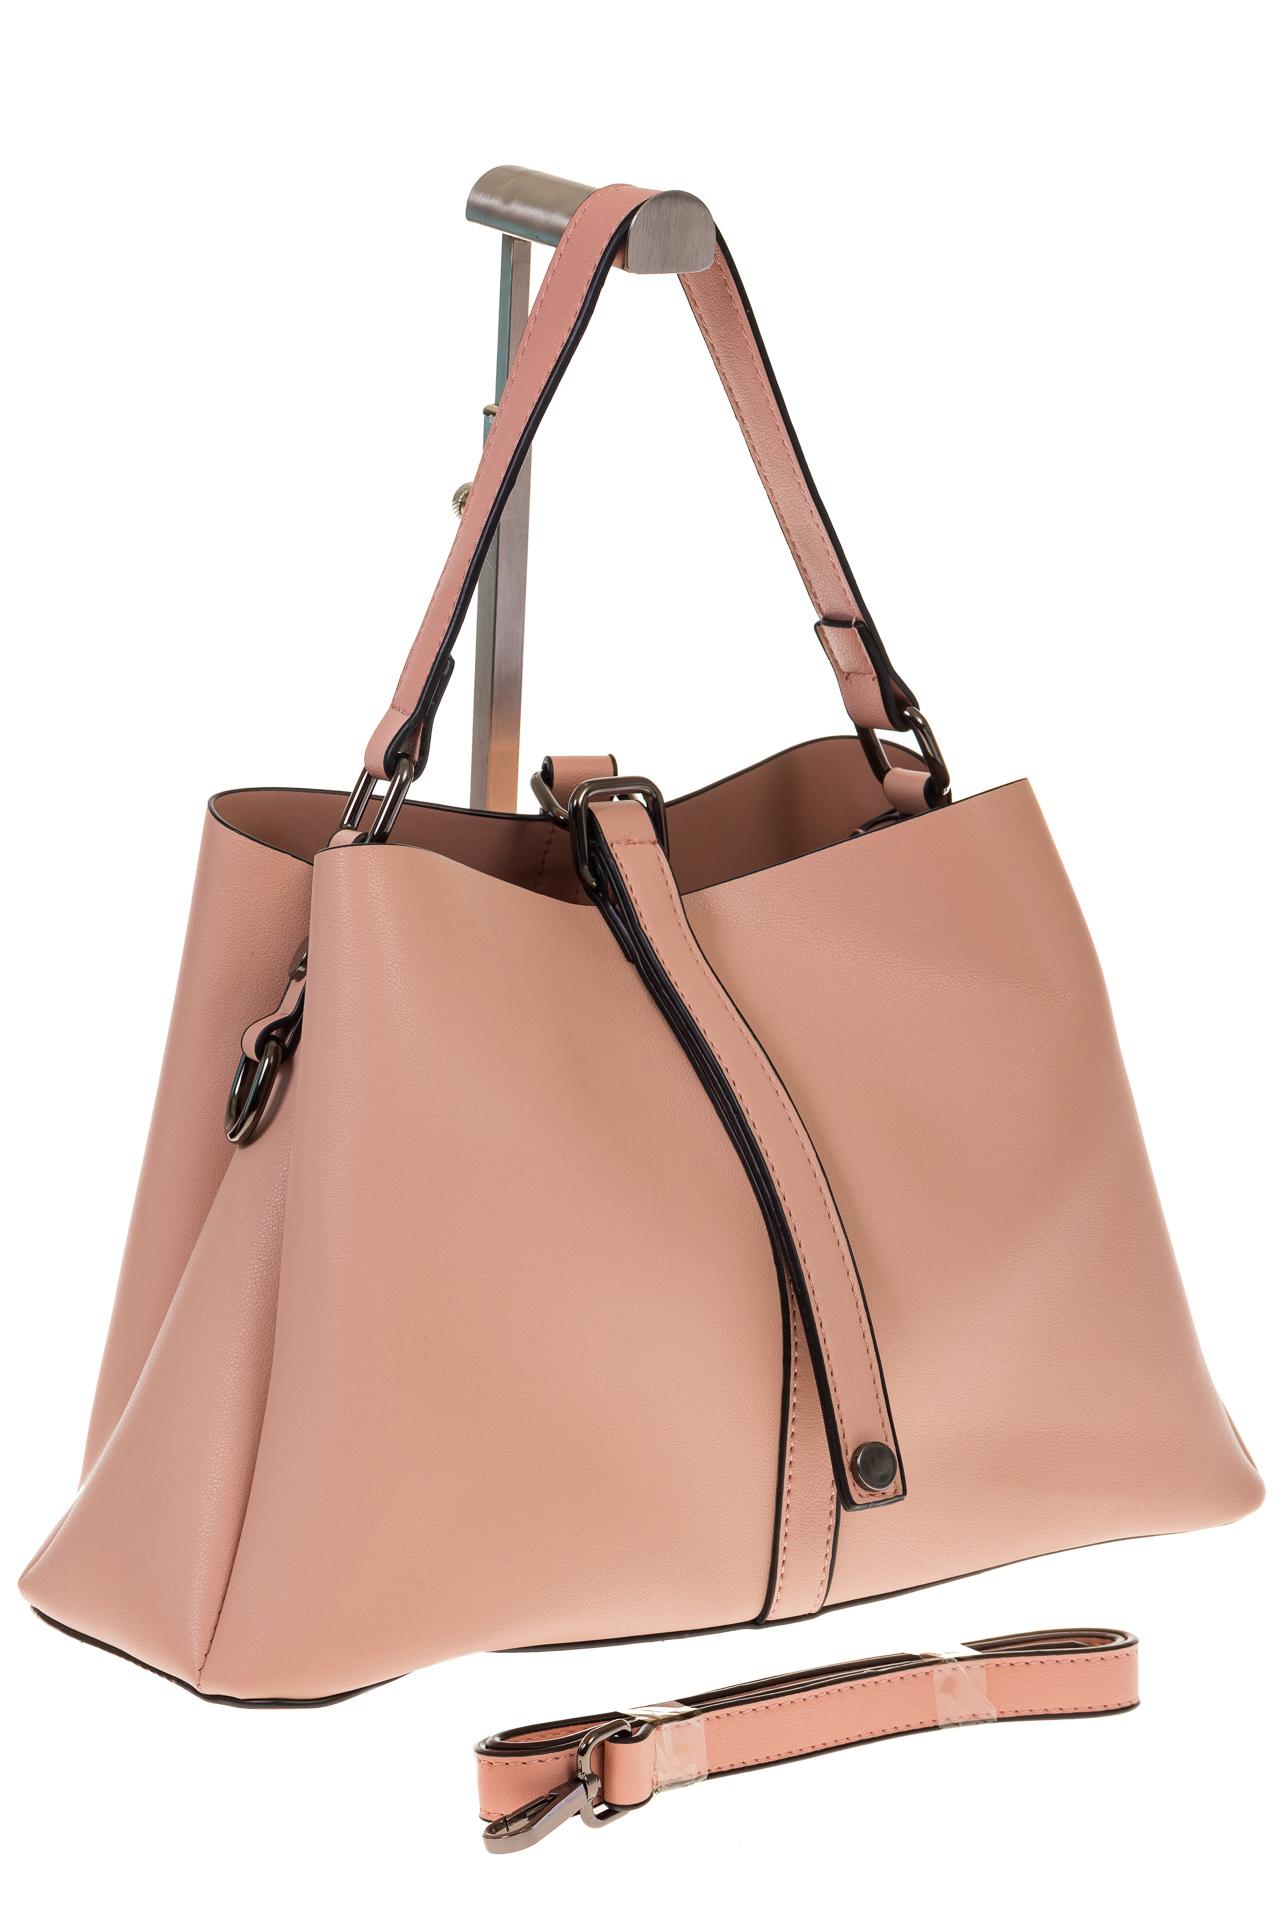 на фото Мягкая сумка-трапеция из искусственной кожи розового цвета 9013MJ5 5c0ebca7e97